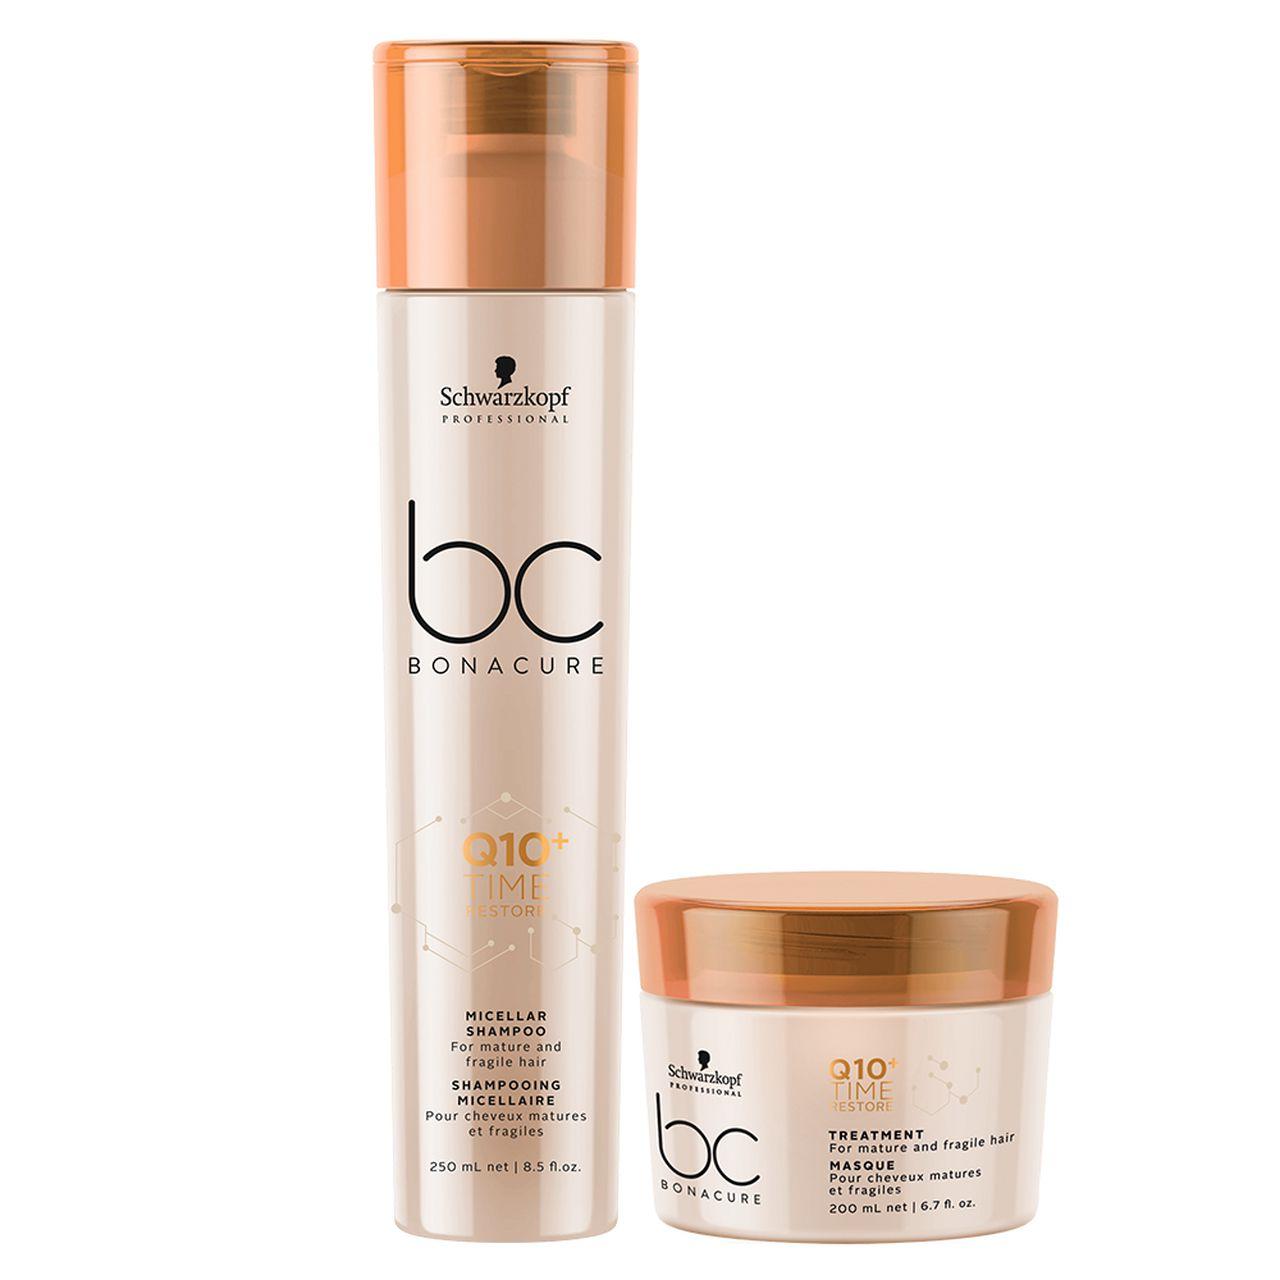 kit Time Restore - Shampoo Micellar + Máscara 200 ml